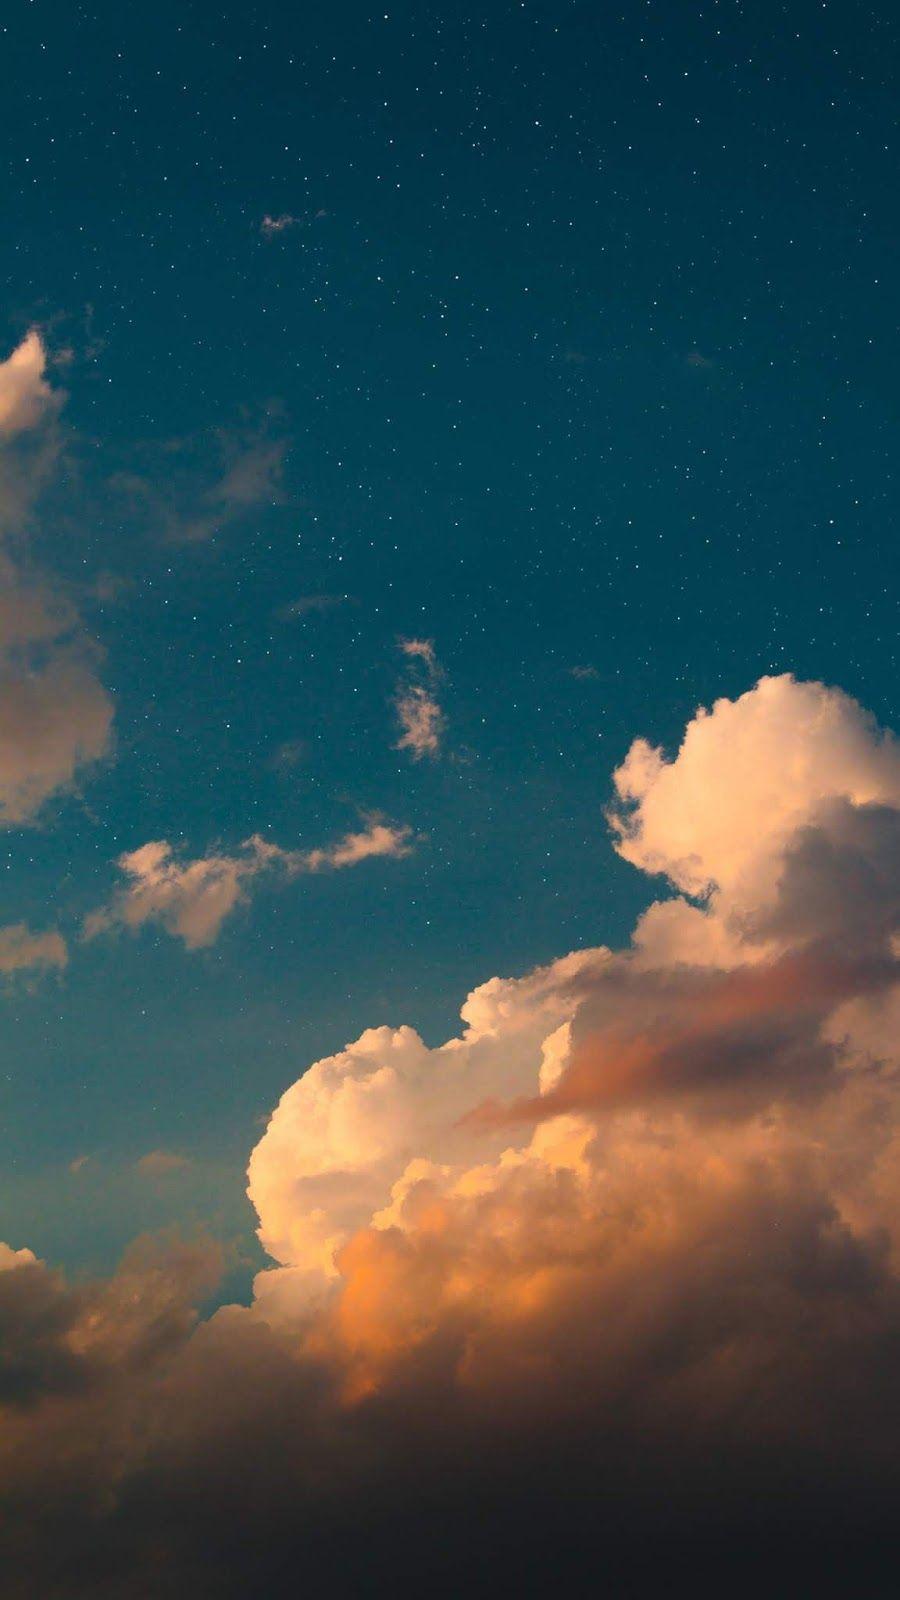 Clouds In The Blue Sky Blue Sky Wallpaper Sky Aesthetic Blue Sky Clouds